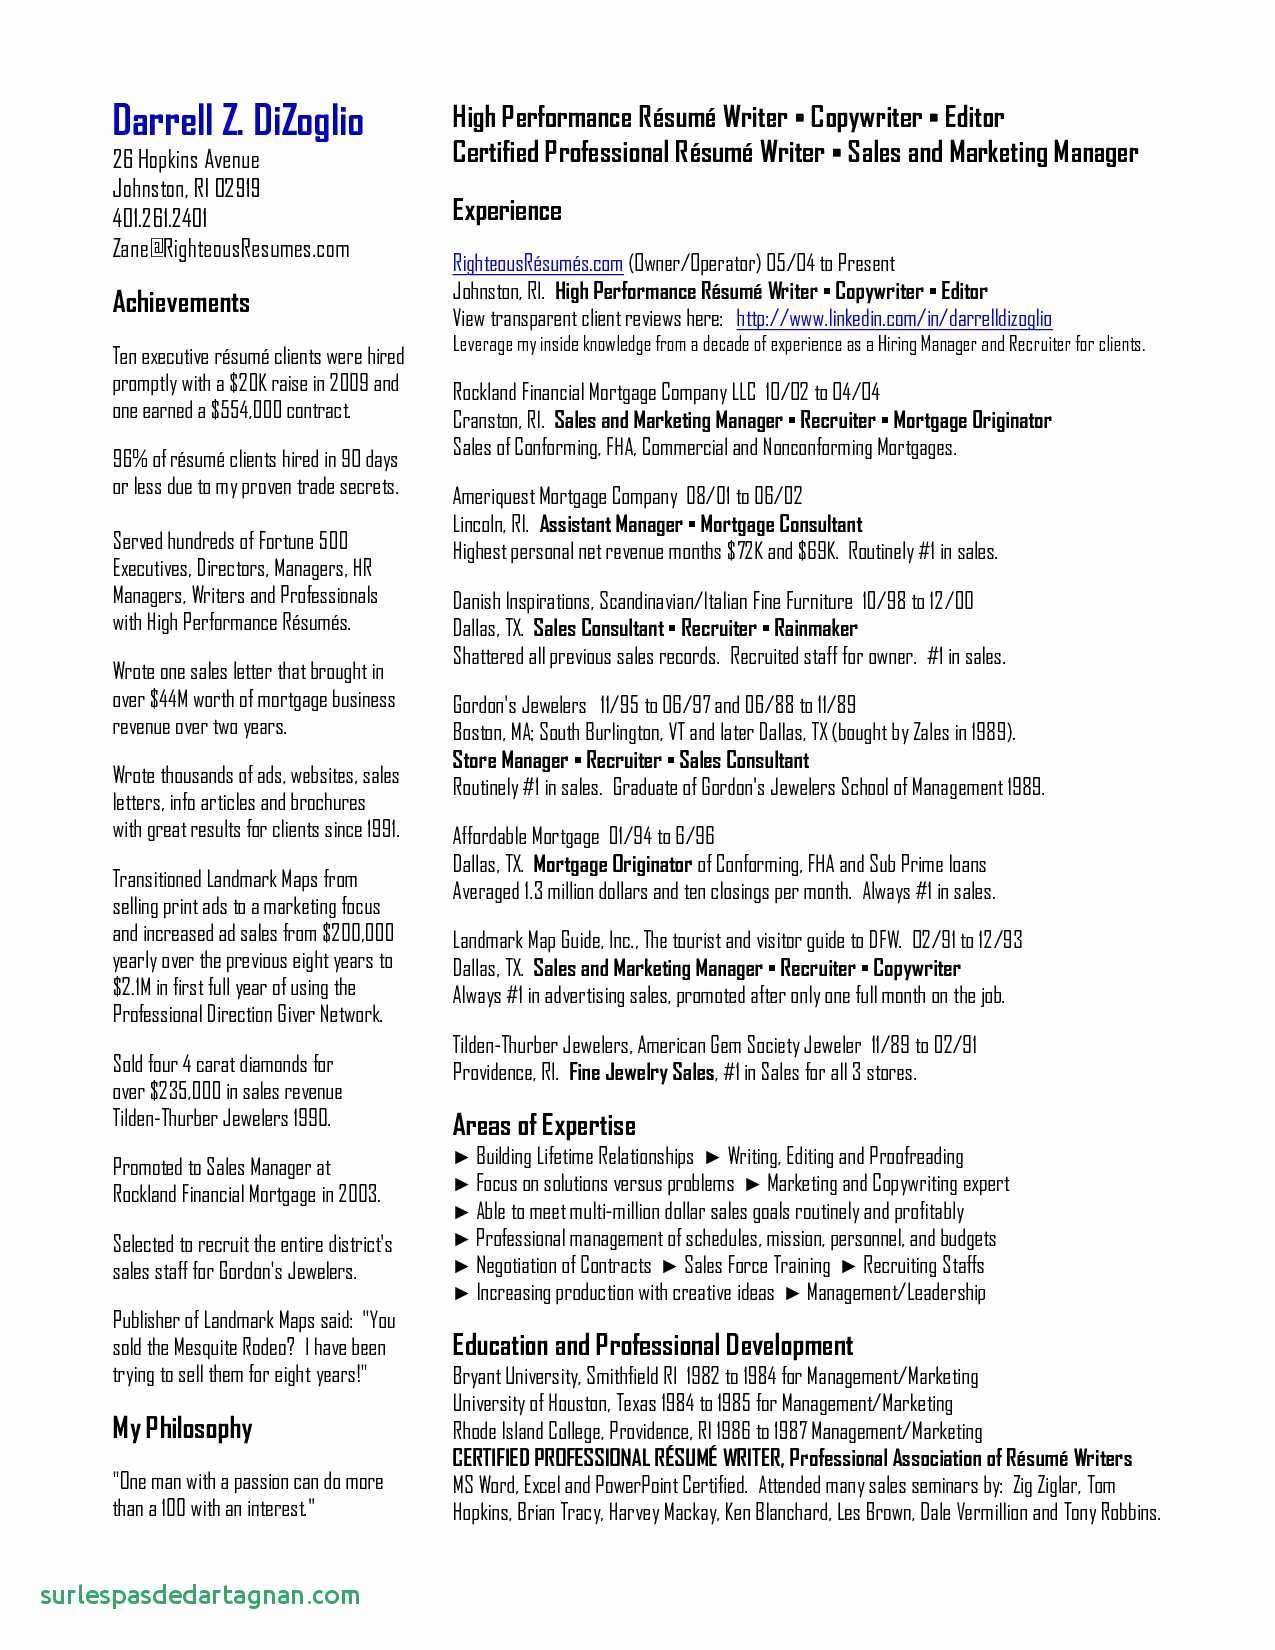 Letter From Santa Free Template Word - Elegant Letter From Santa Template Word